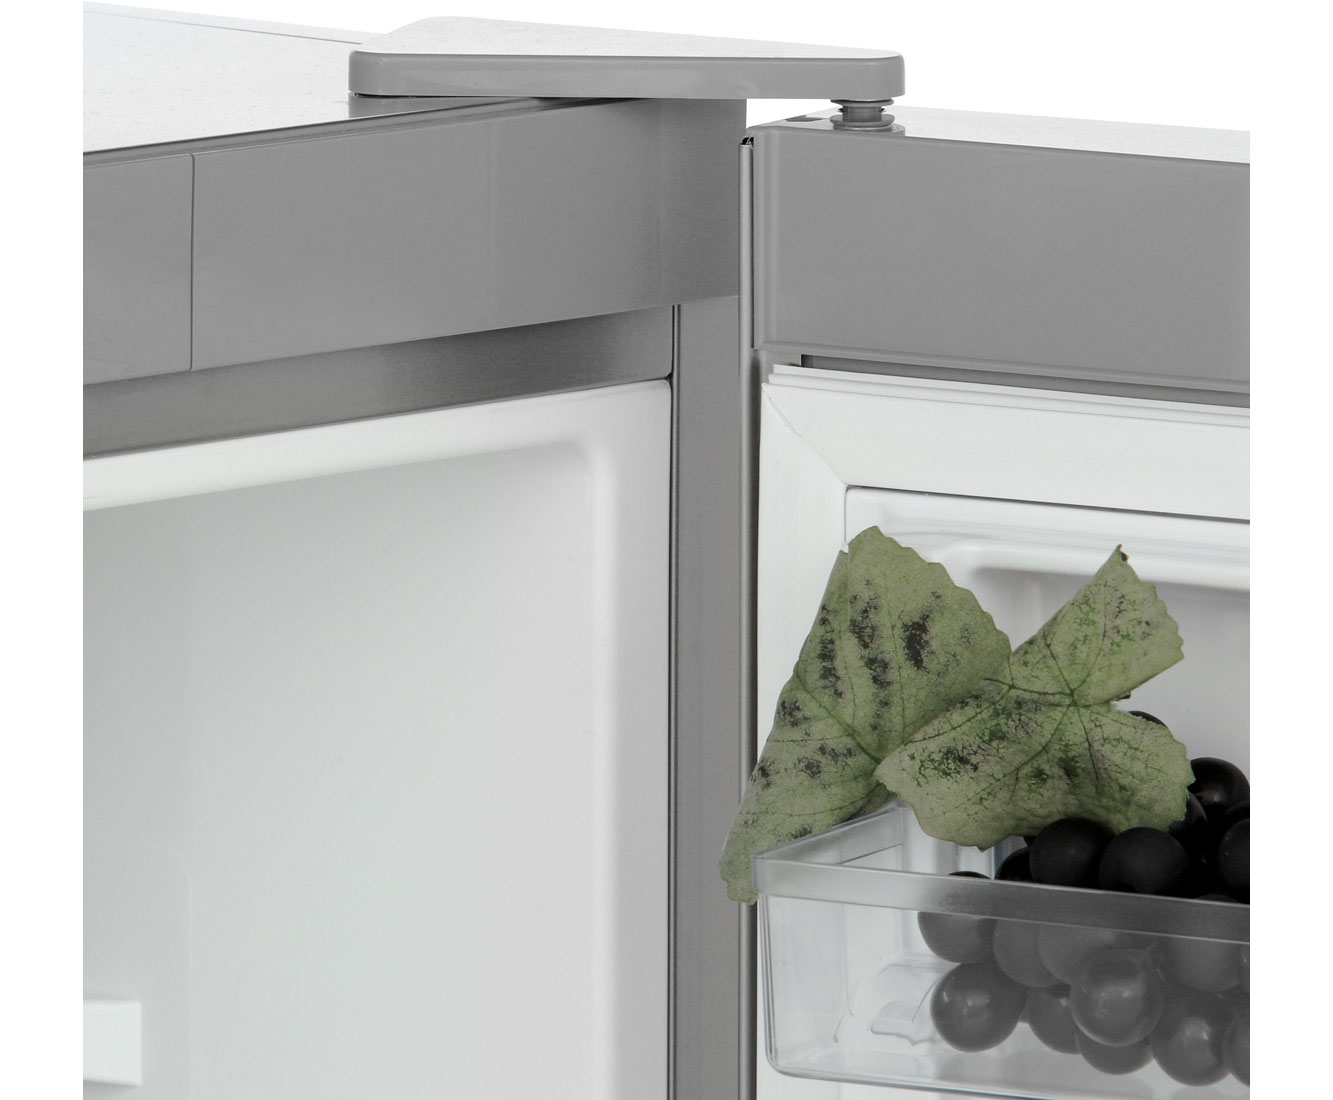 Gorenje Kühlschrank Silber : Gorenje r fx kühlschrank freistehend cm edelstahl neu ebay